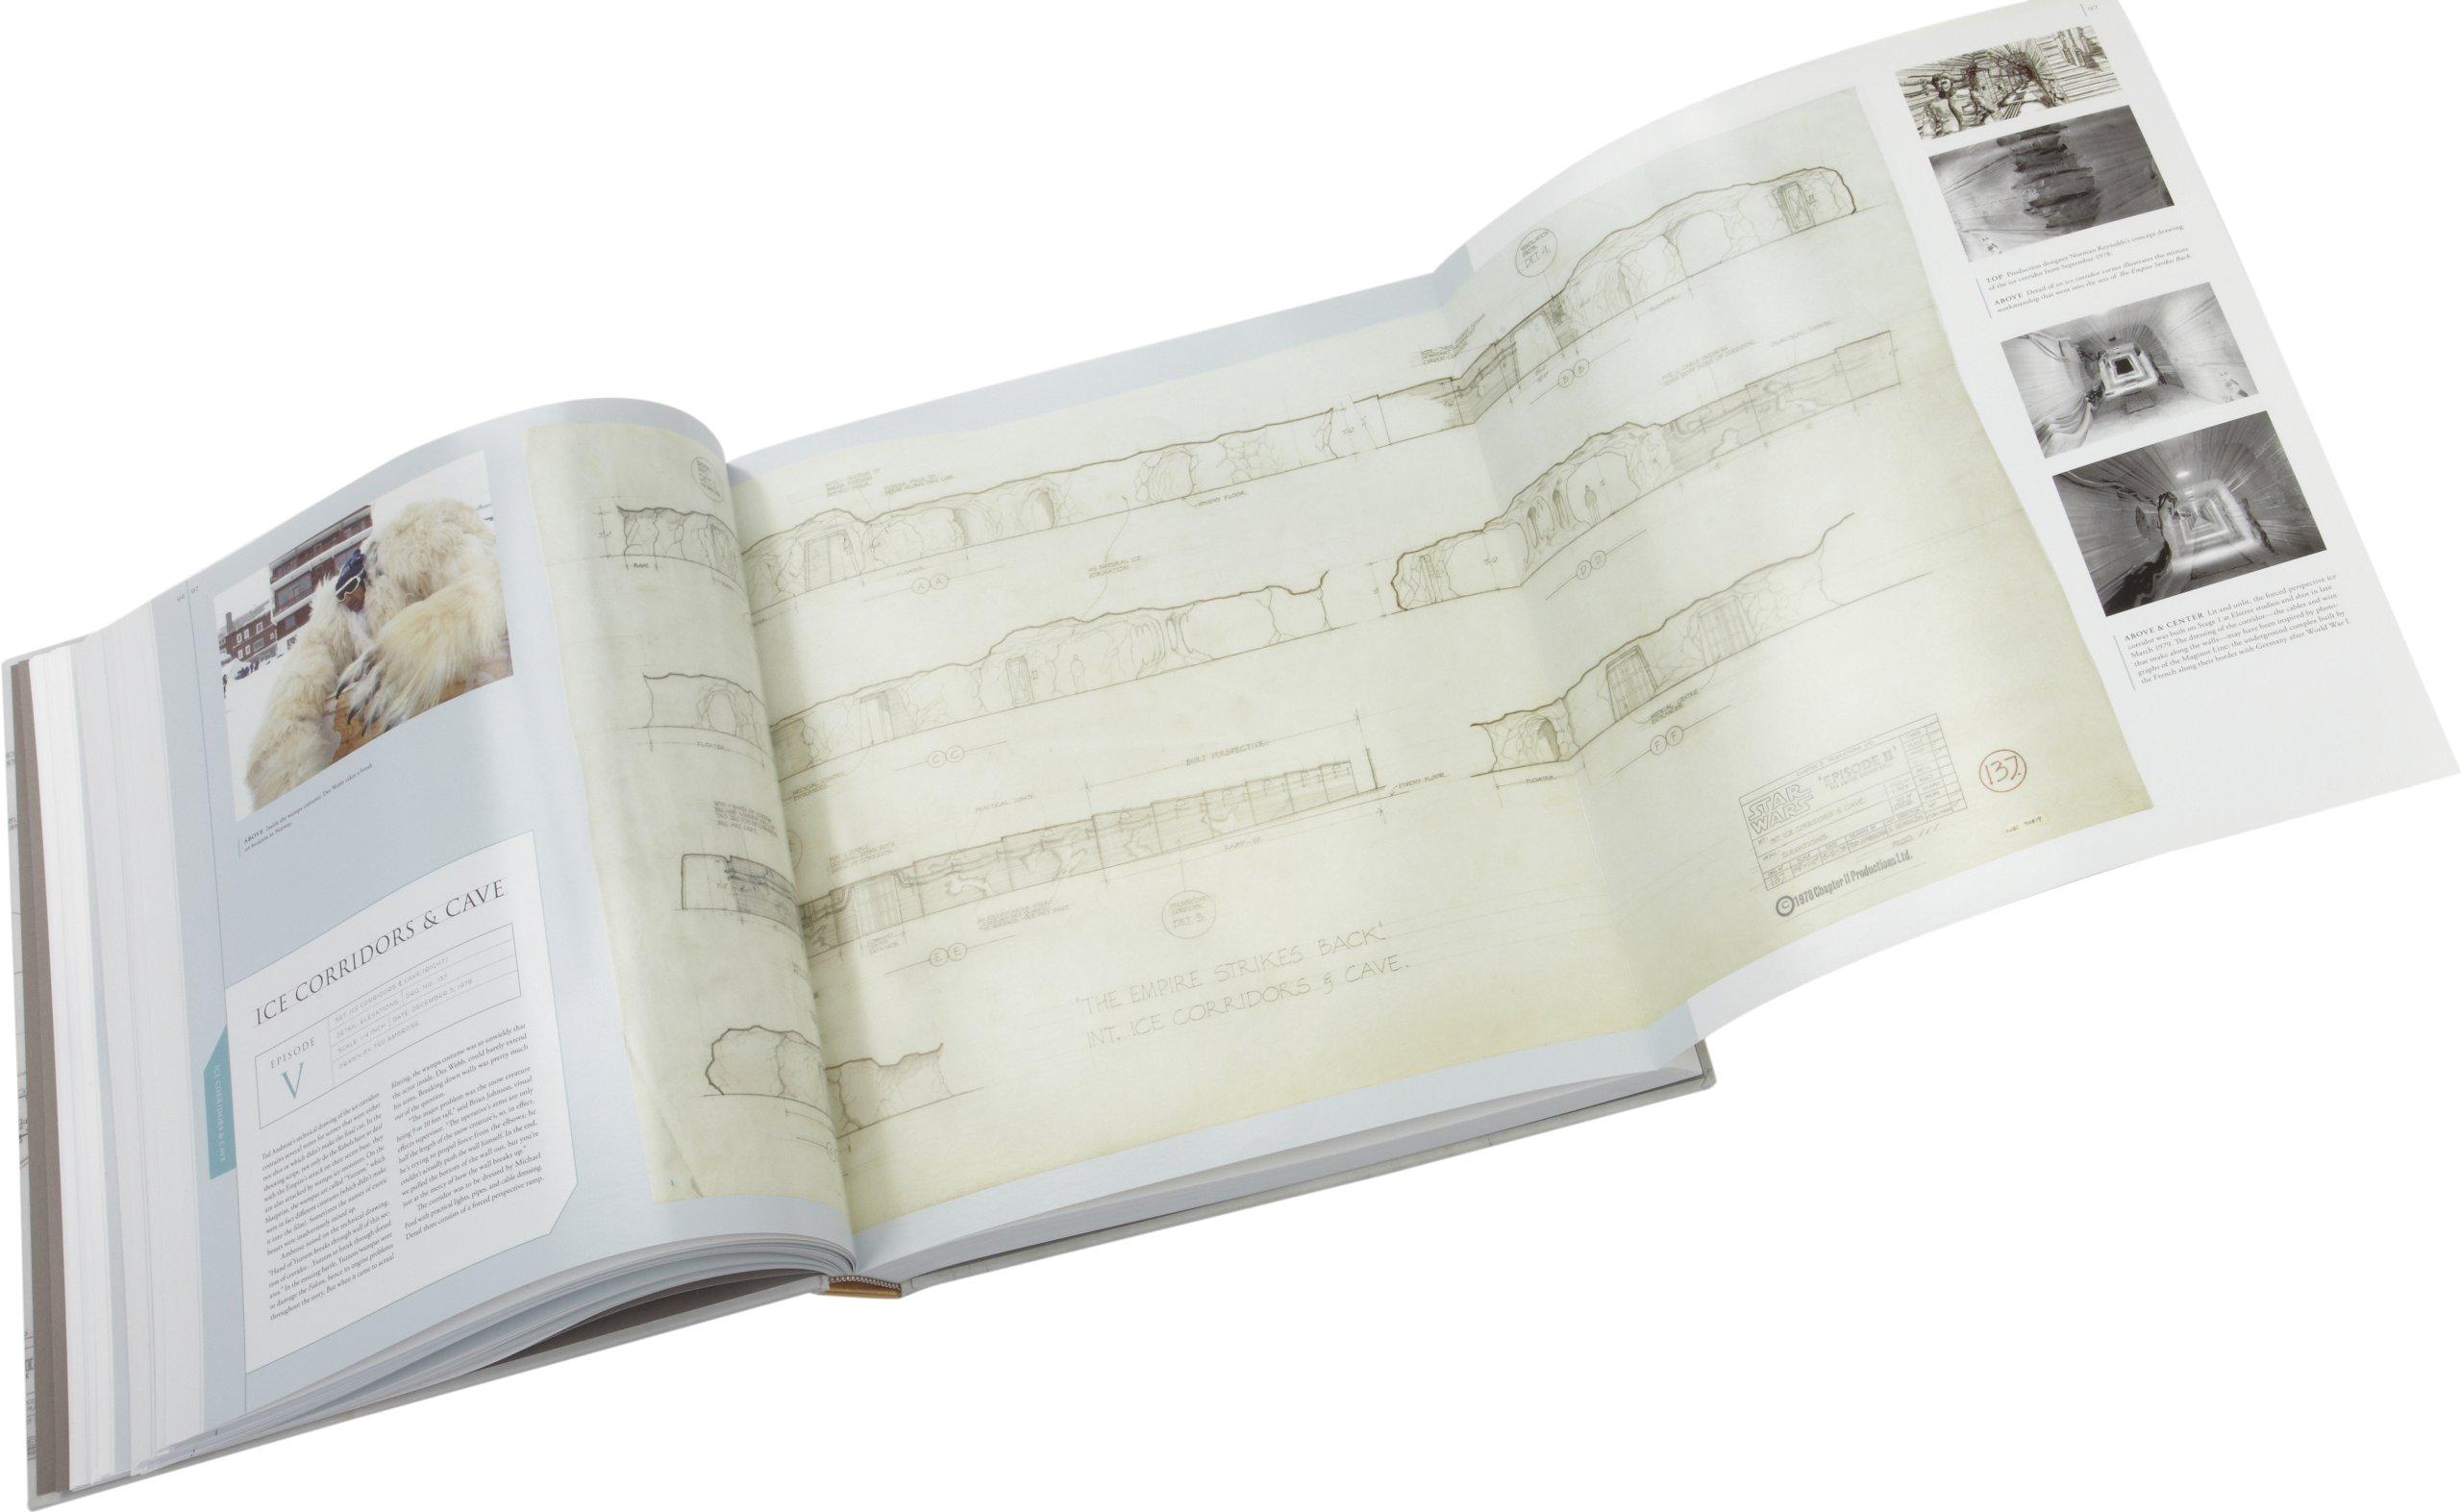 Star wars the blueprints amazon j w rinzler libros en idiomas star wars the blueprints amazon j w rinzler libros en idiomas extranjeros malvernweather Choice Image